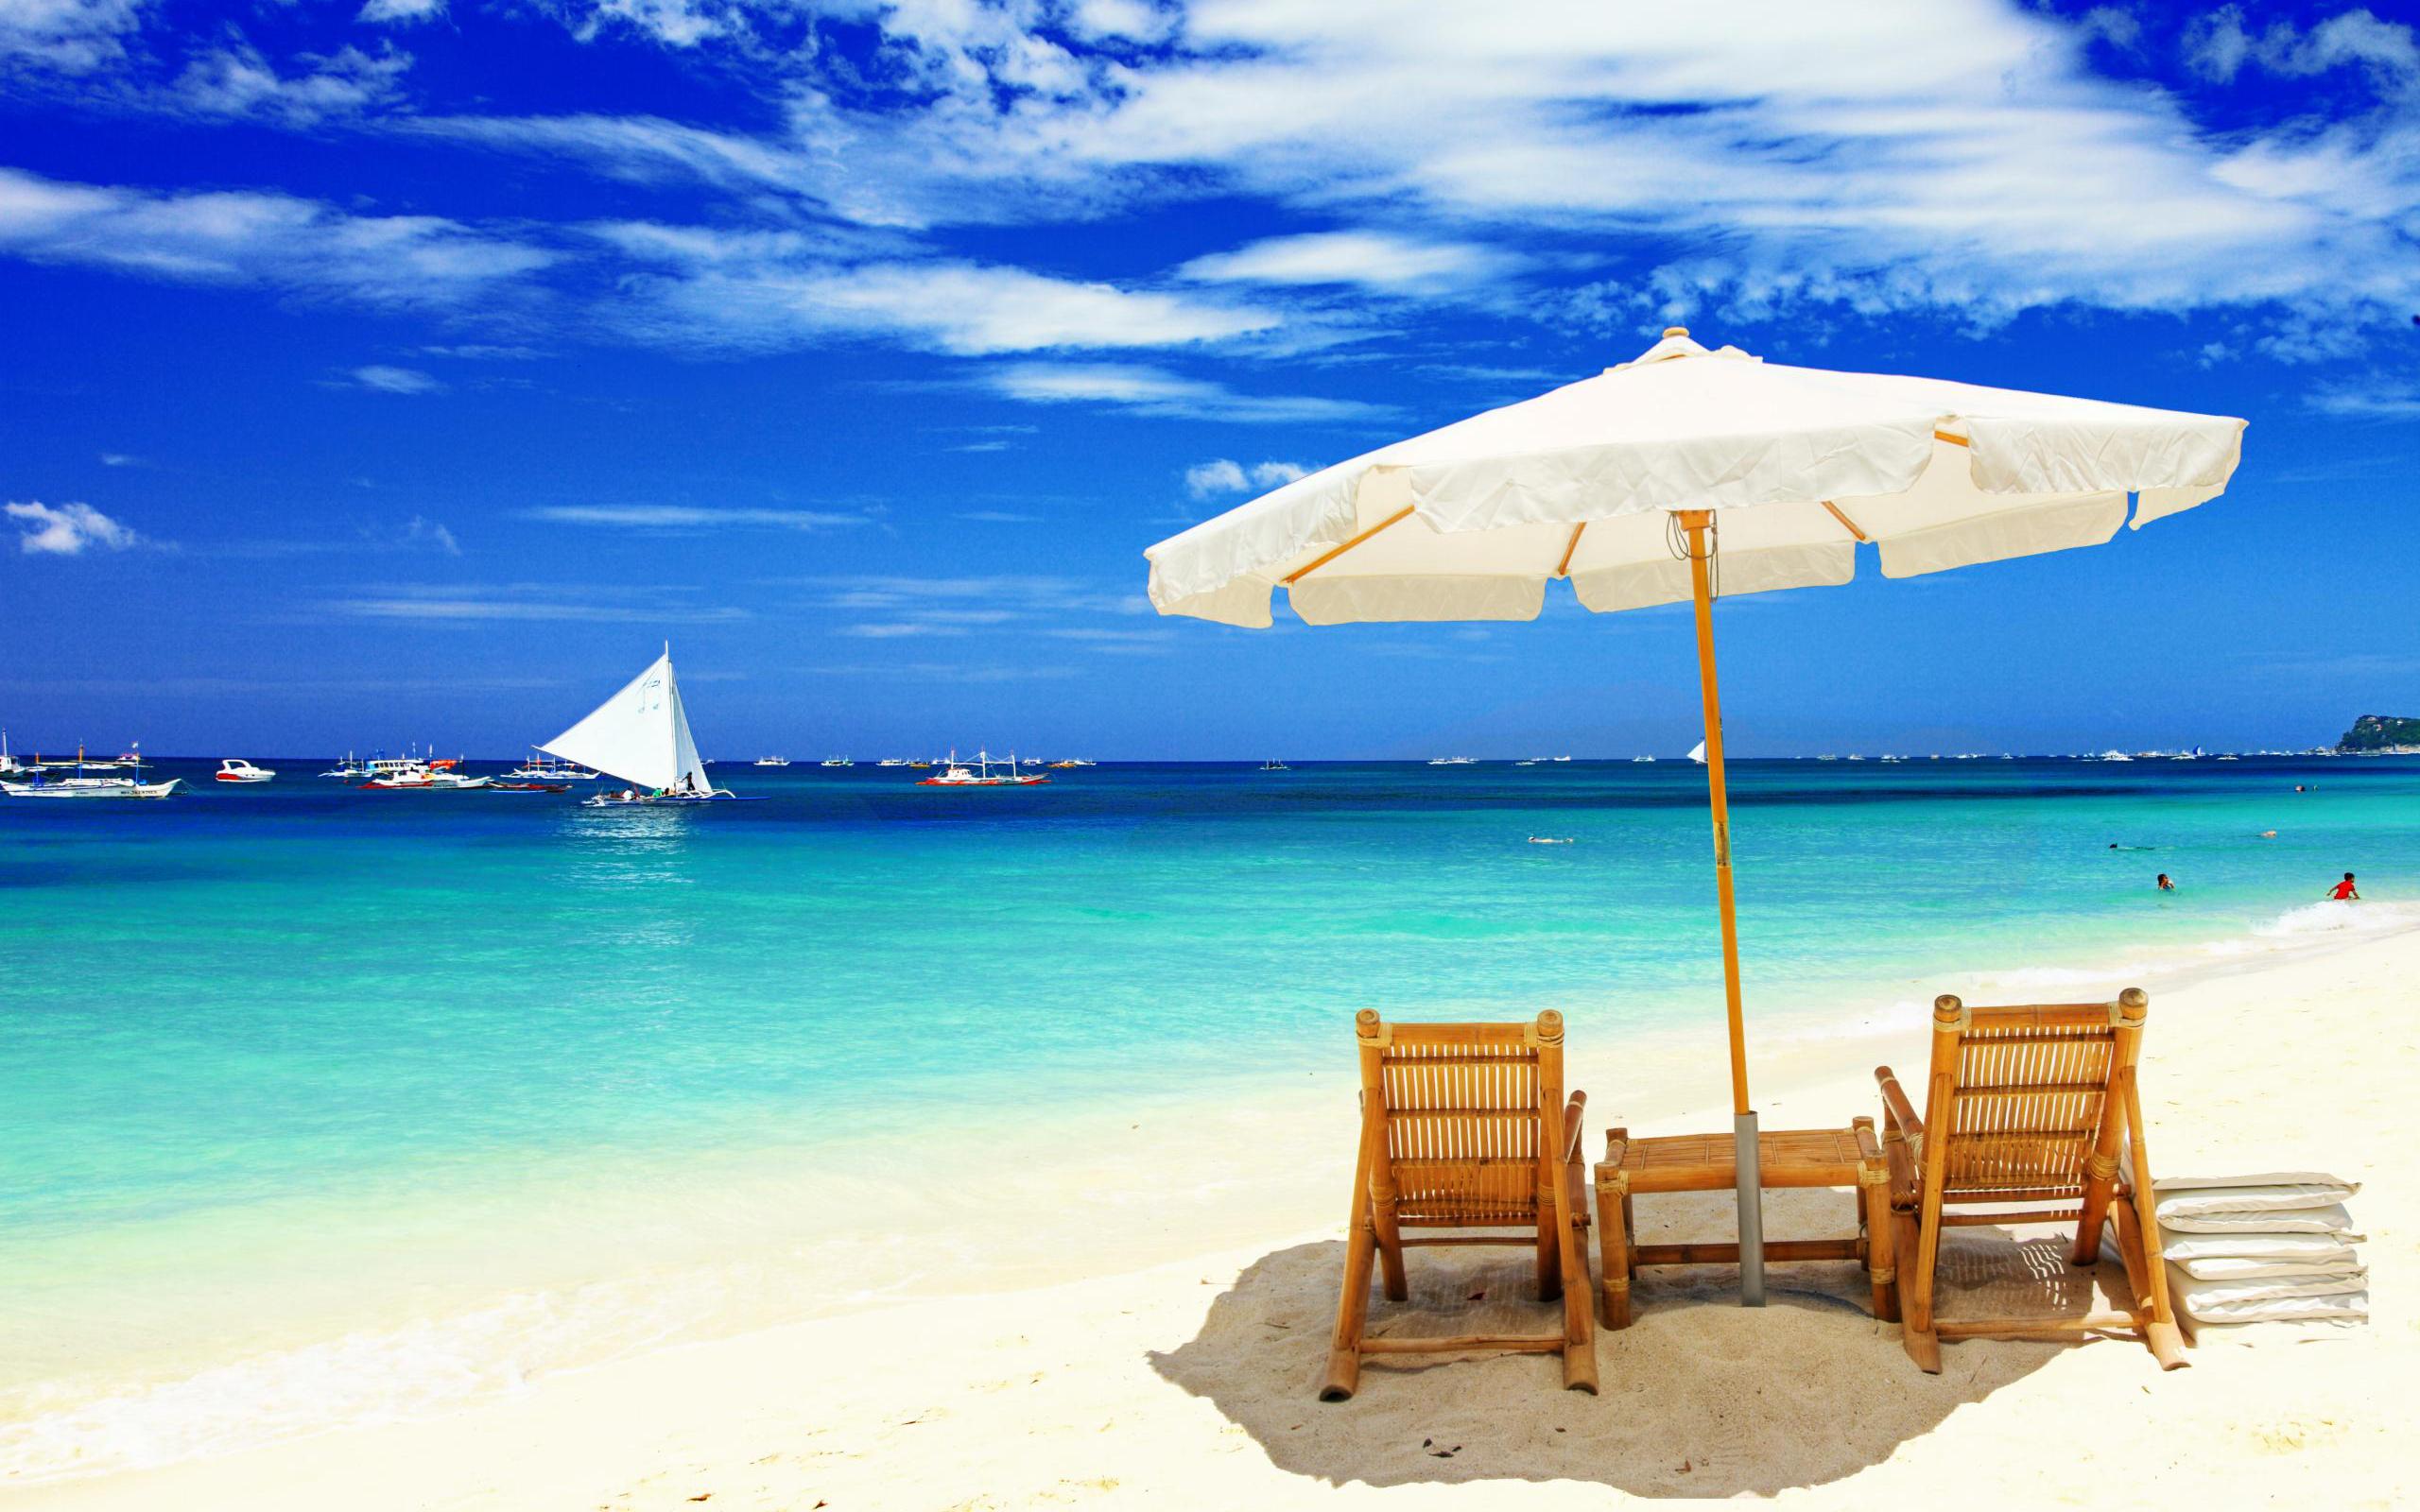 Free Download Wonderful Beach Hd Wallpaper Nature Amp